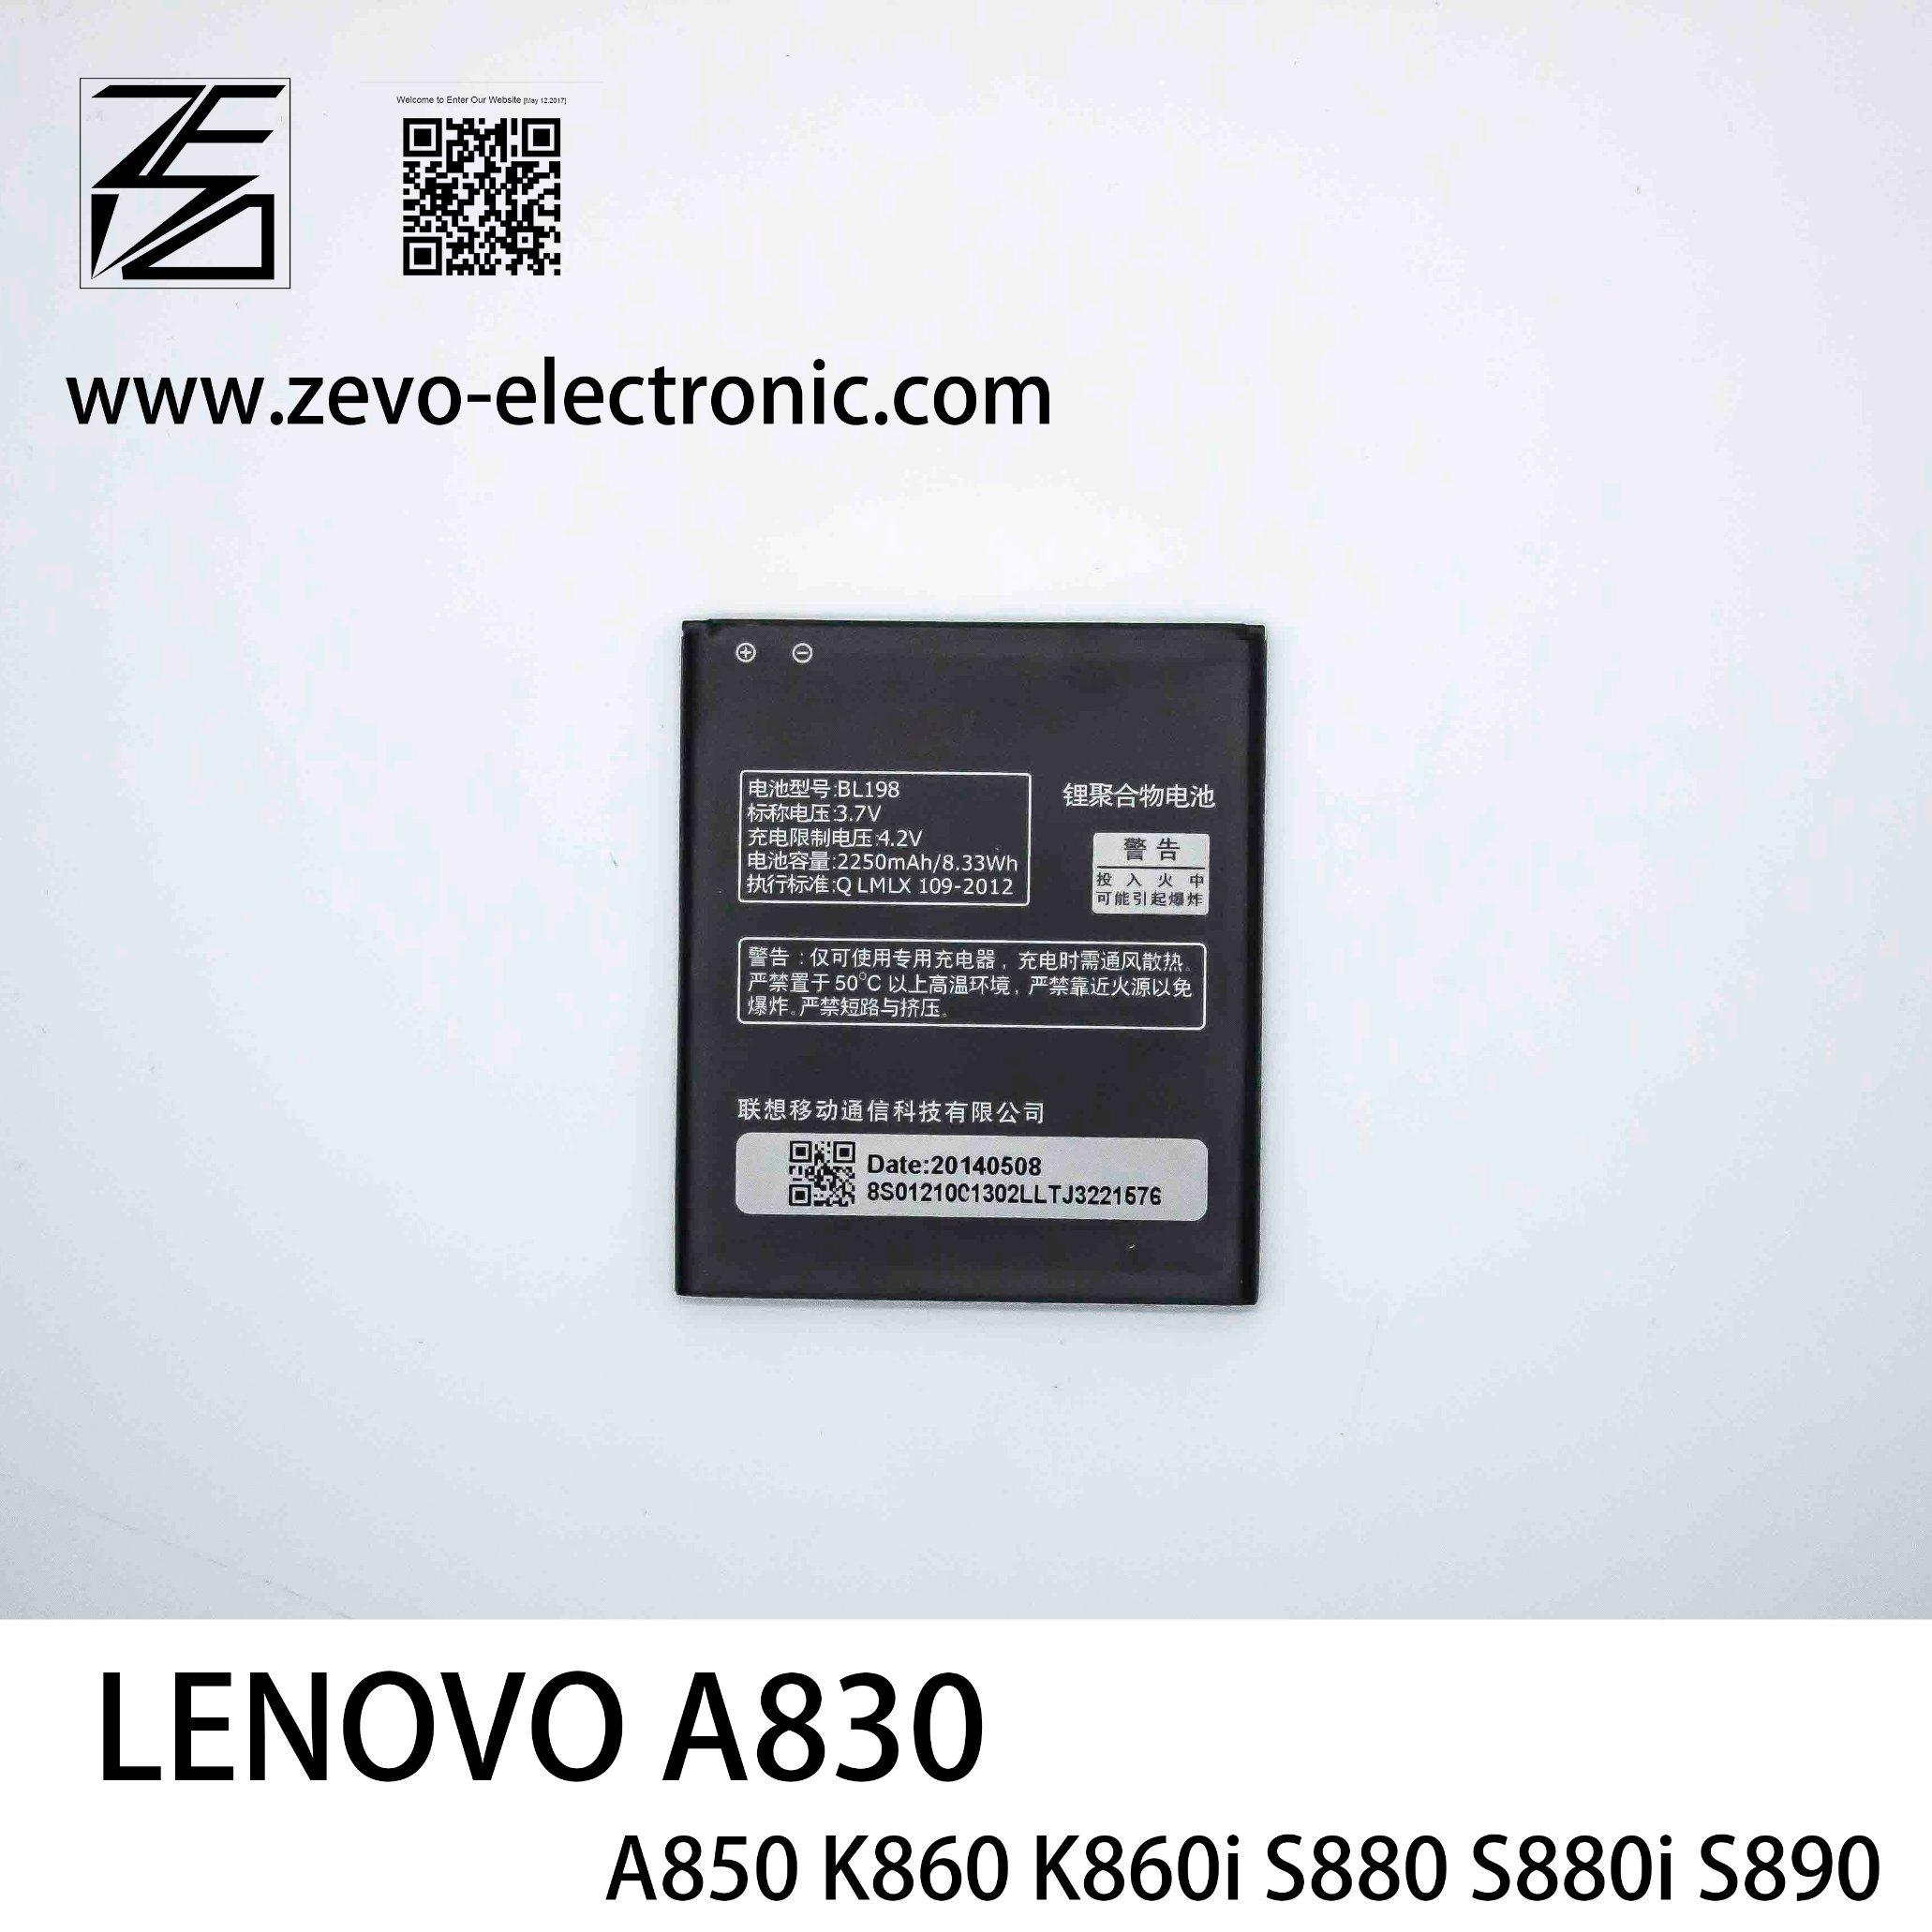 Promo Harga Lenovo S890 Update 2018 Tcash Vaganza 28 Produk Ukm Bumn Cheese Stick 300gr Original China High Quality Mobile Phone Battery For A859 A860e A850 A830 Bl198 Manufacturer